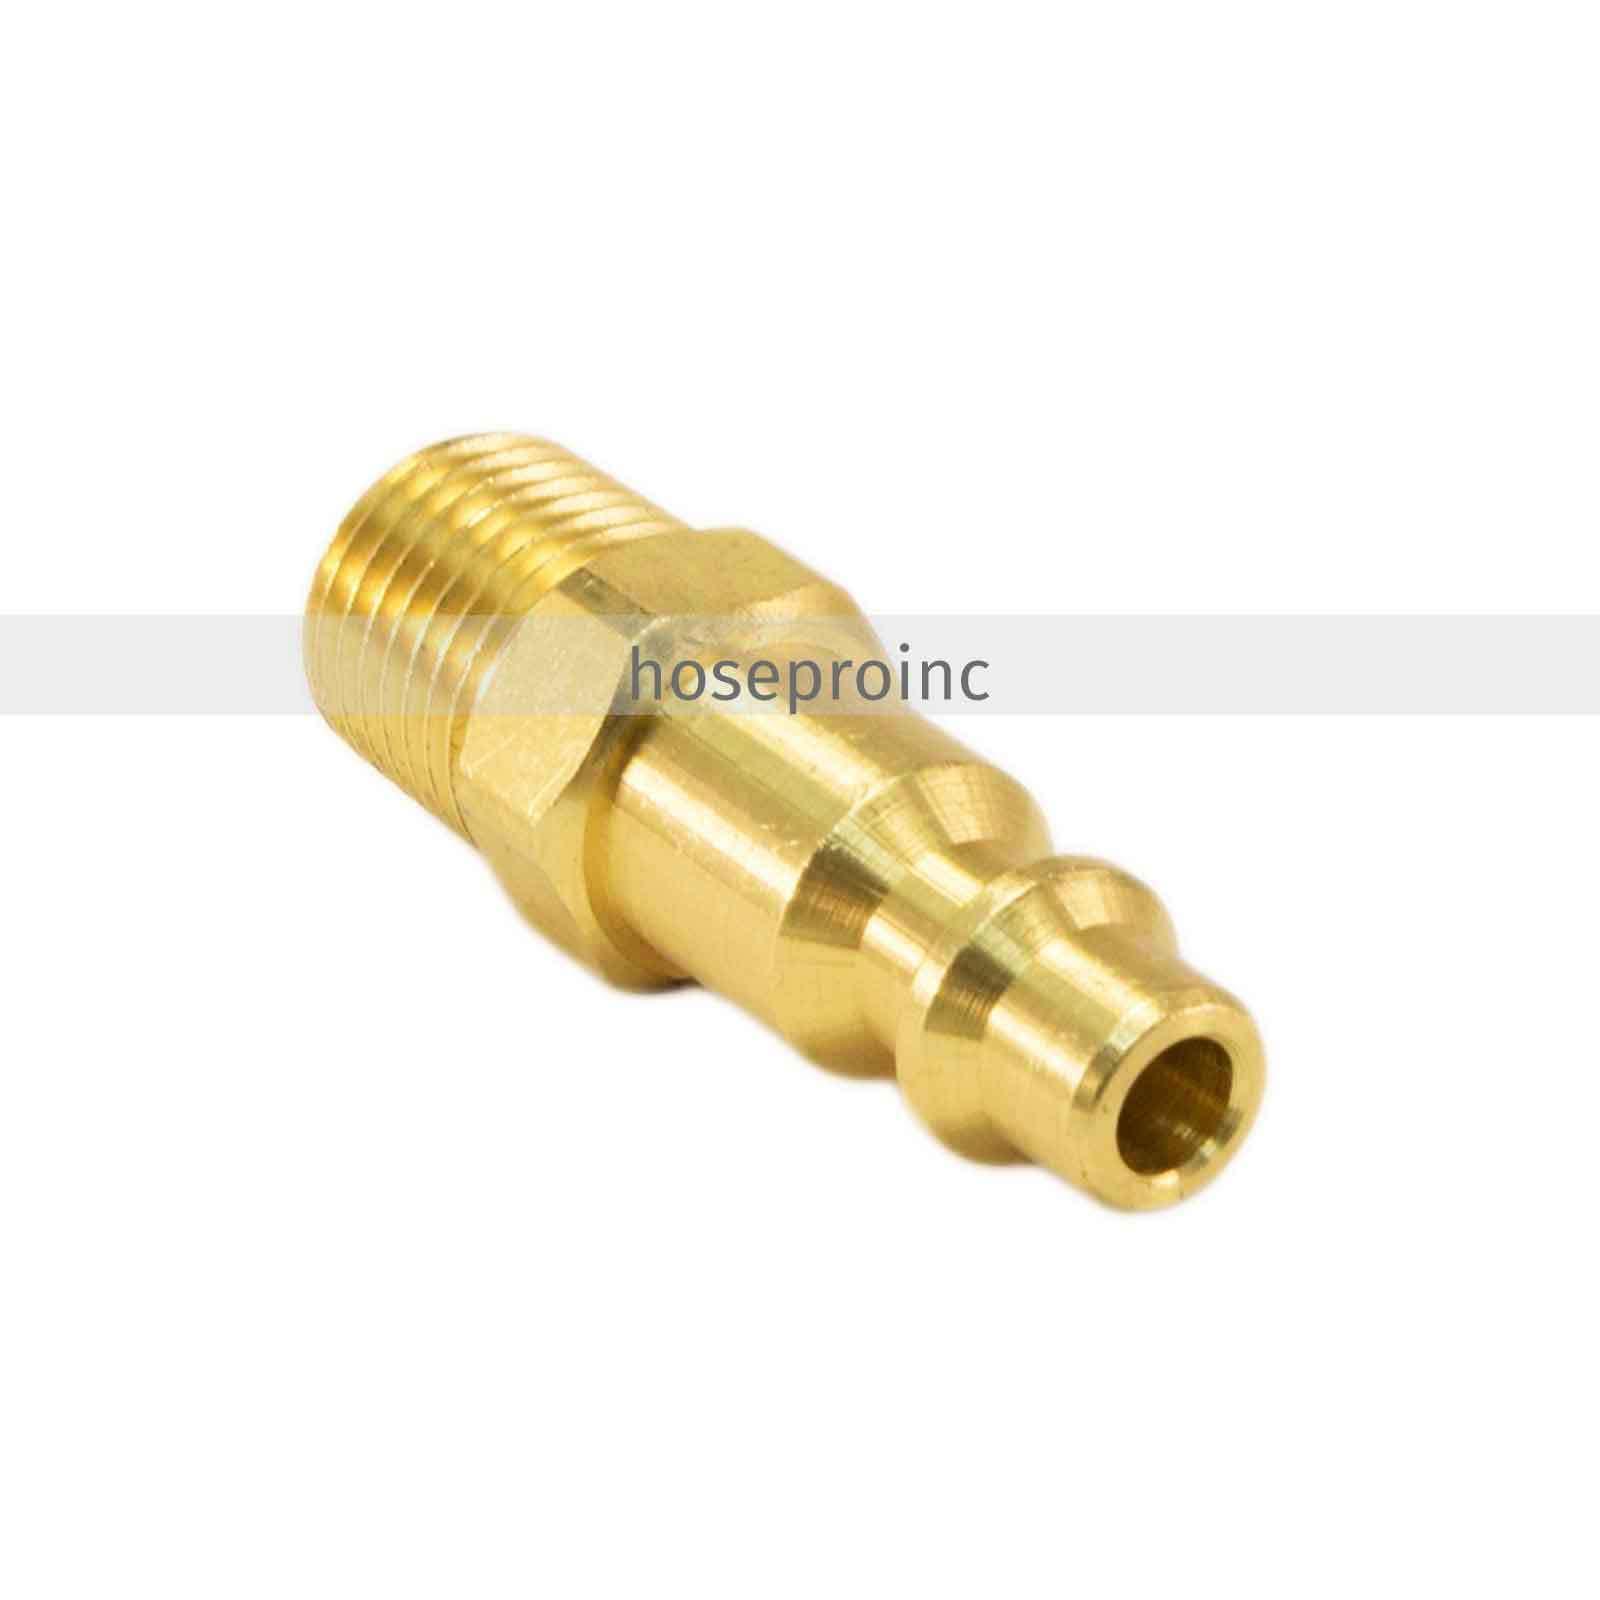 25pc 1/4 NPT Air Hose Fittings M M M Style Tool Line Compressor Construction Plug db7ac9